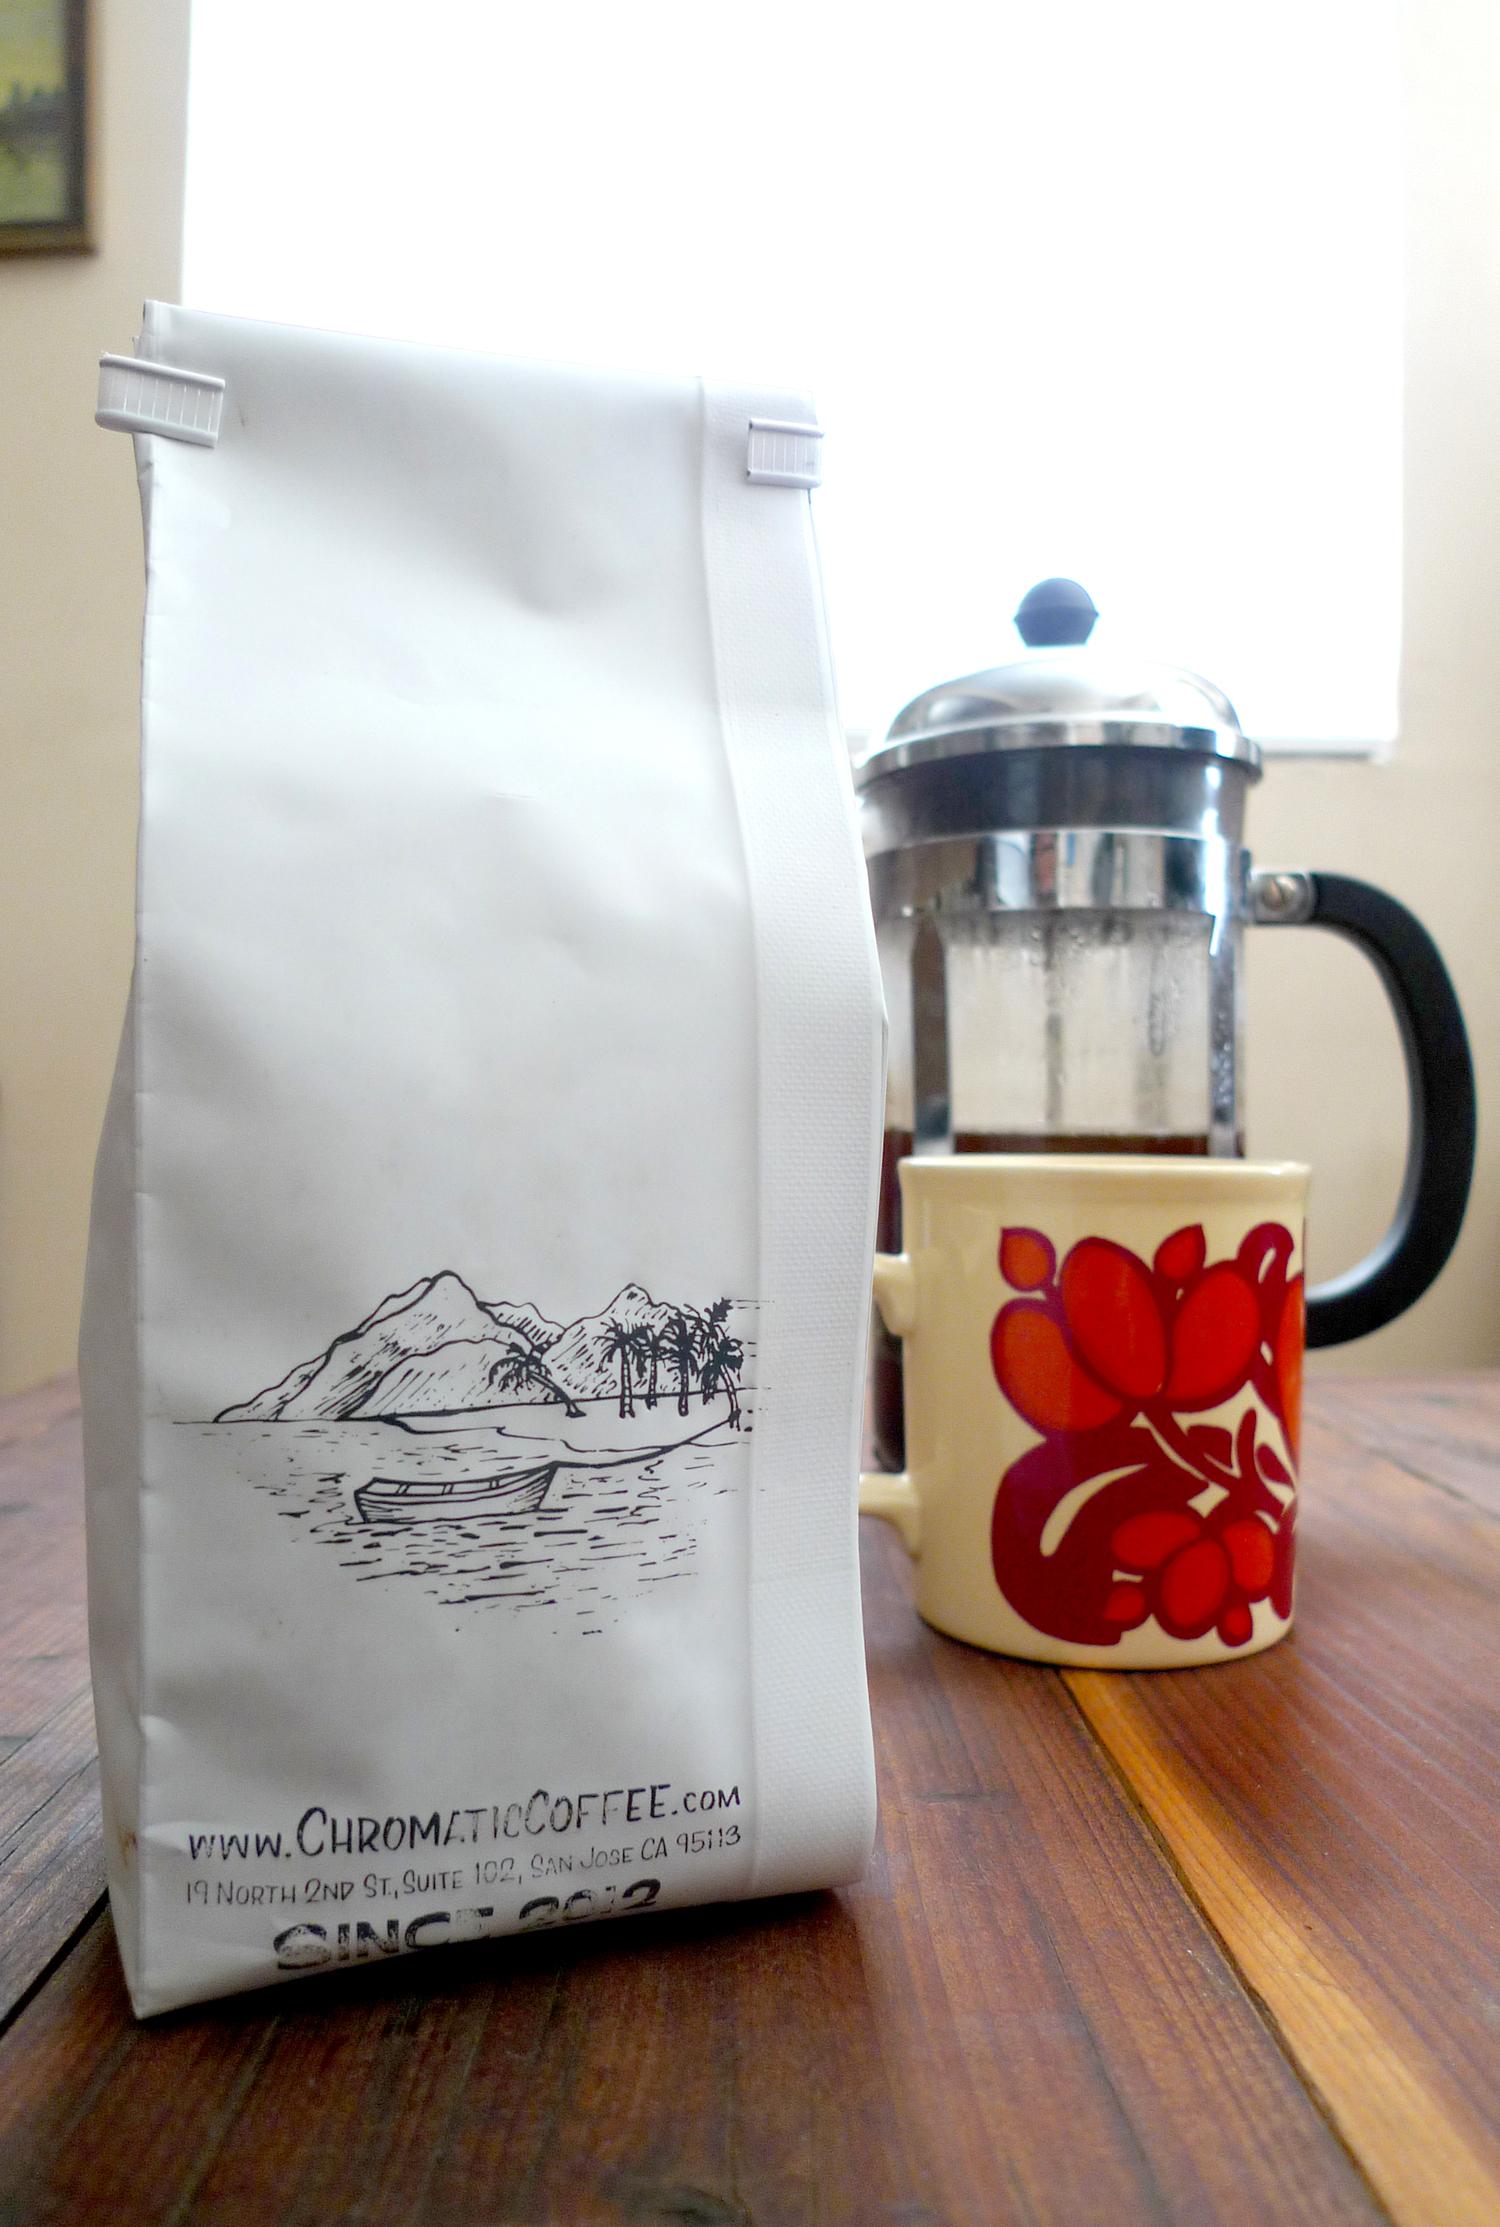 Chromatic Coffee Bag backview 1500px.JPG